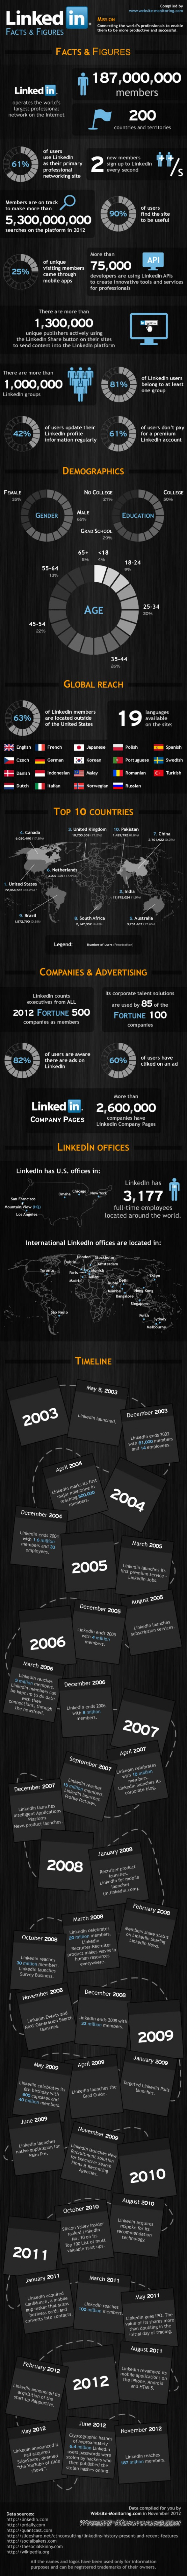 Linkedin Jaaroverzicht